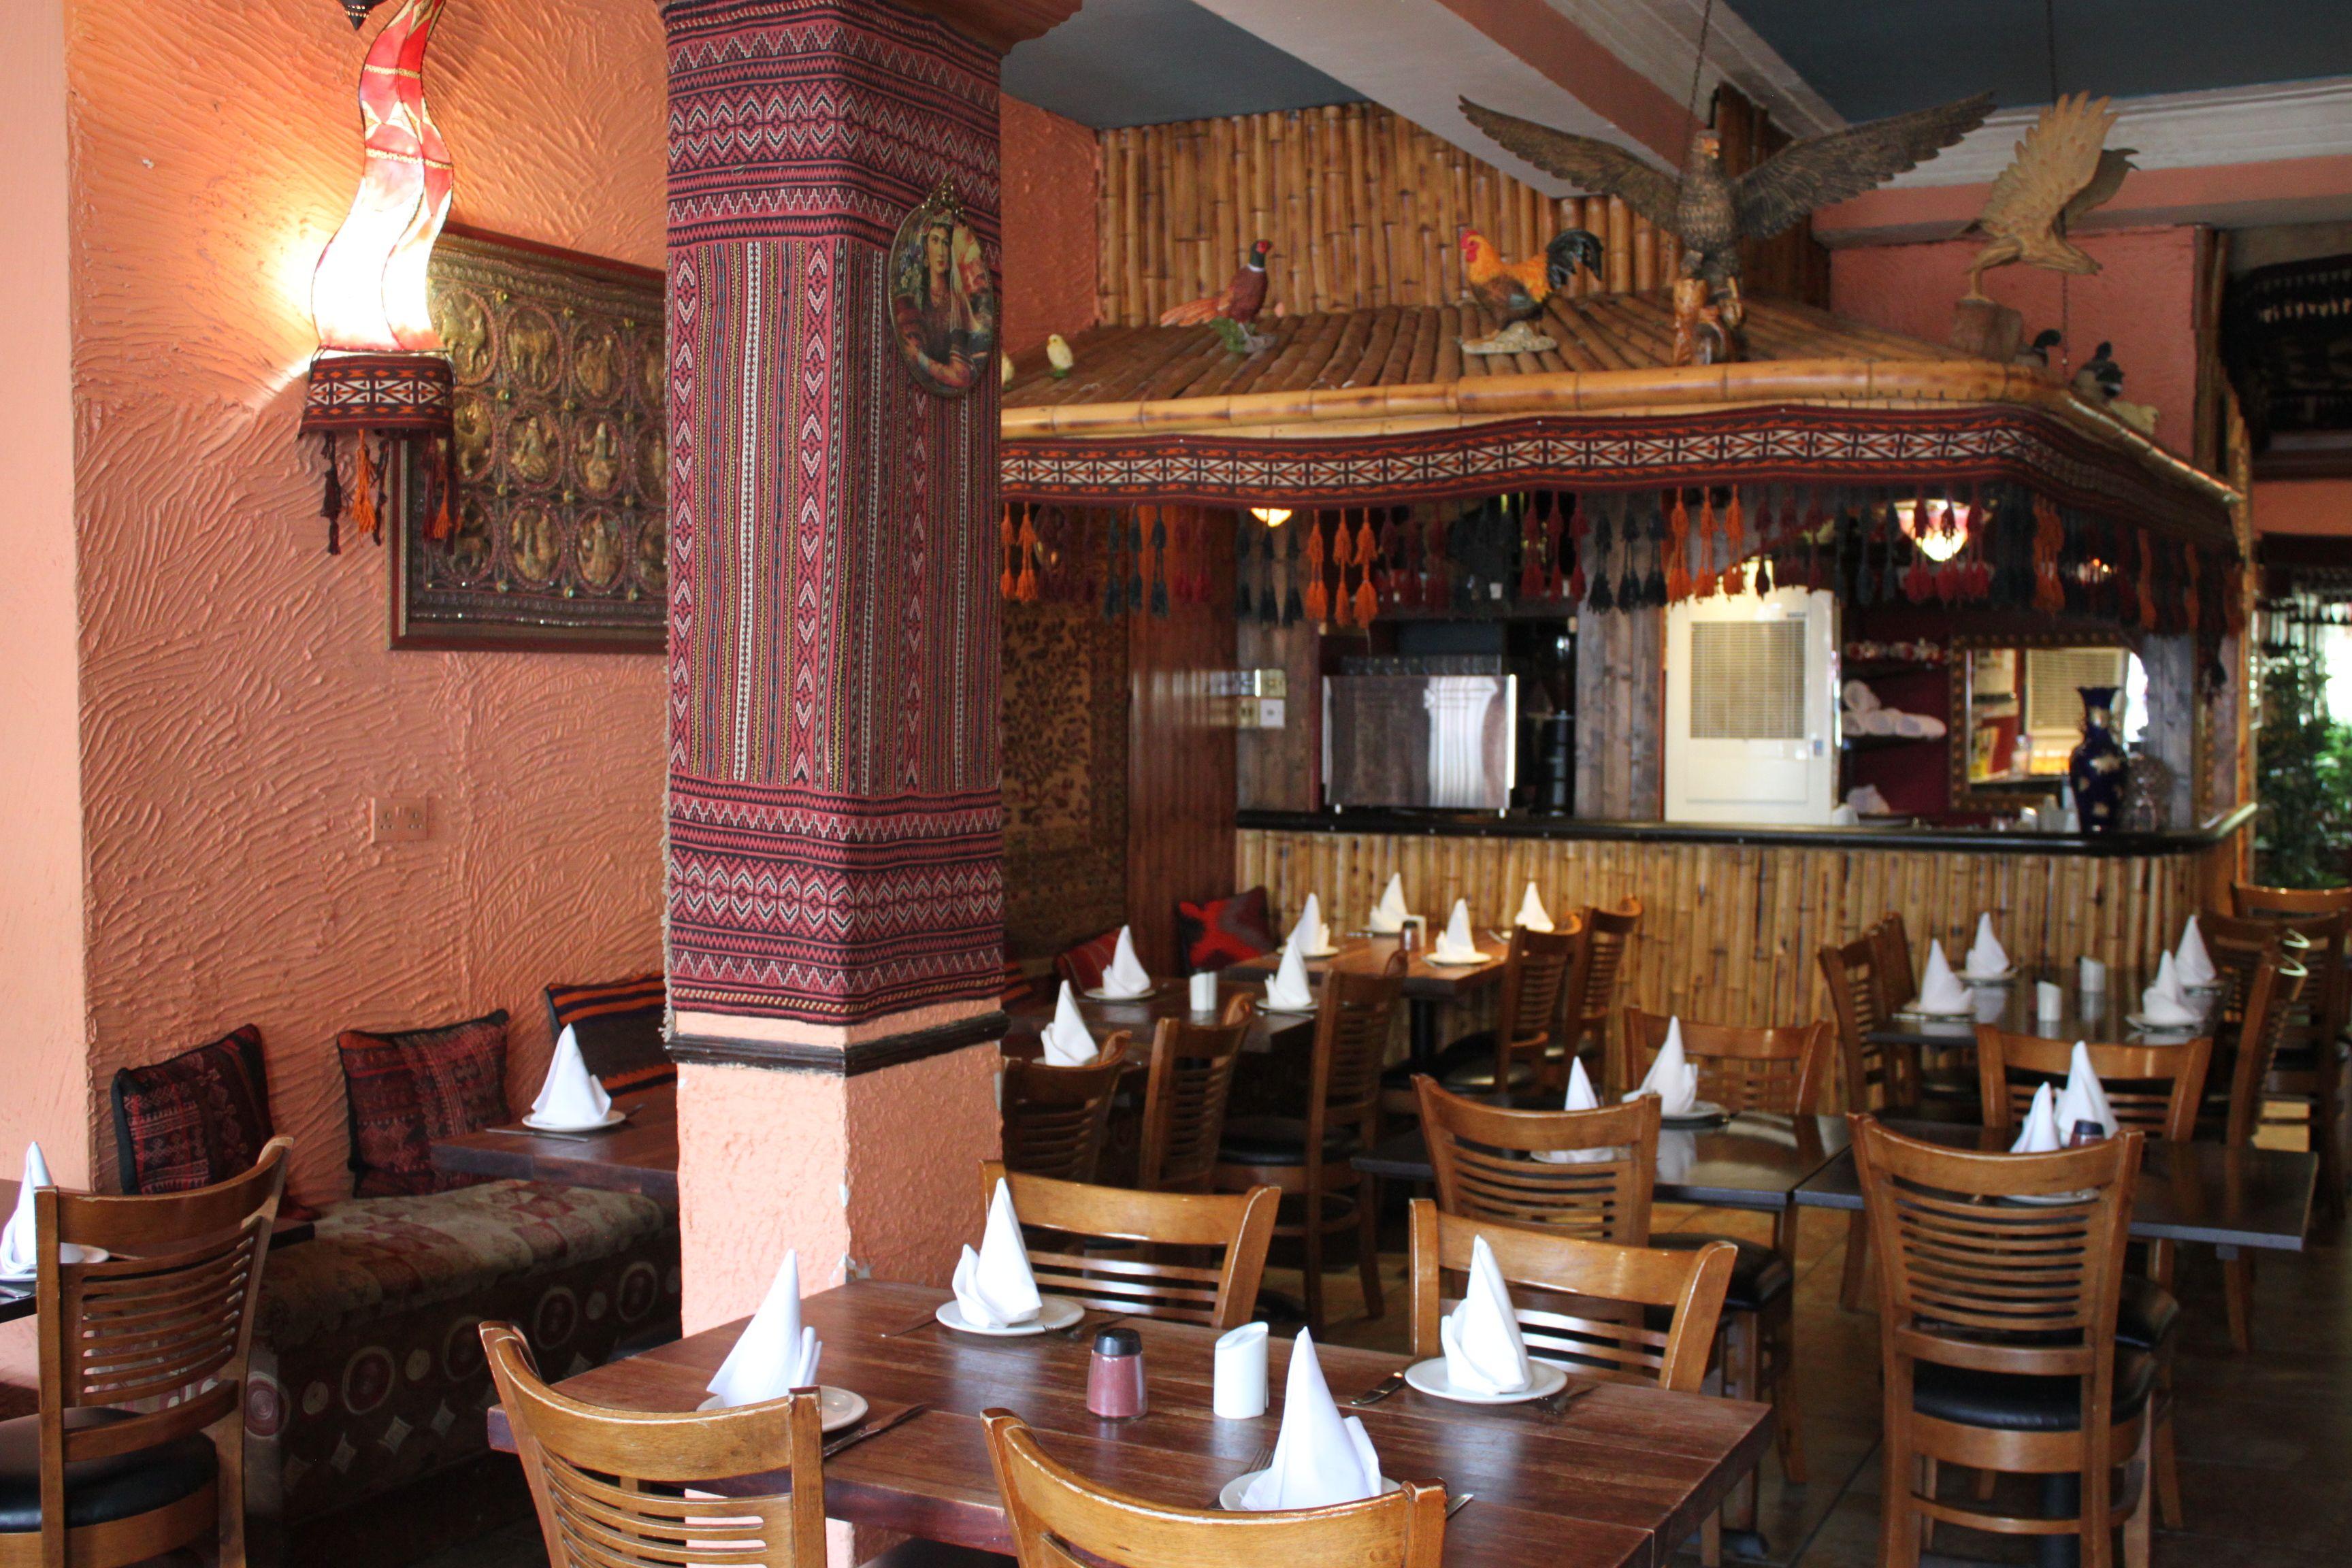 Ariana Restaurant Halal Persian And Afghan Cuisine Afghan Cuisine Persian Cuisine Restaurant